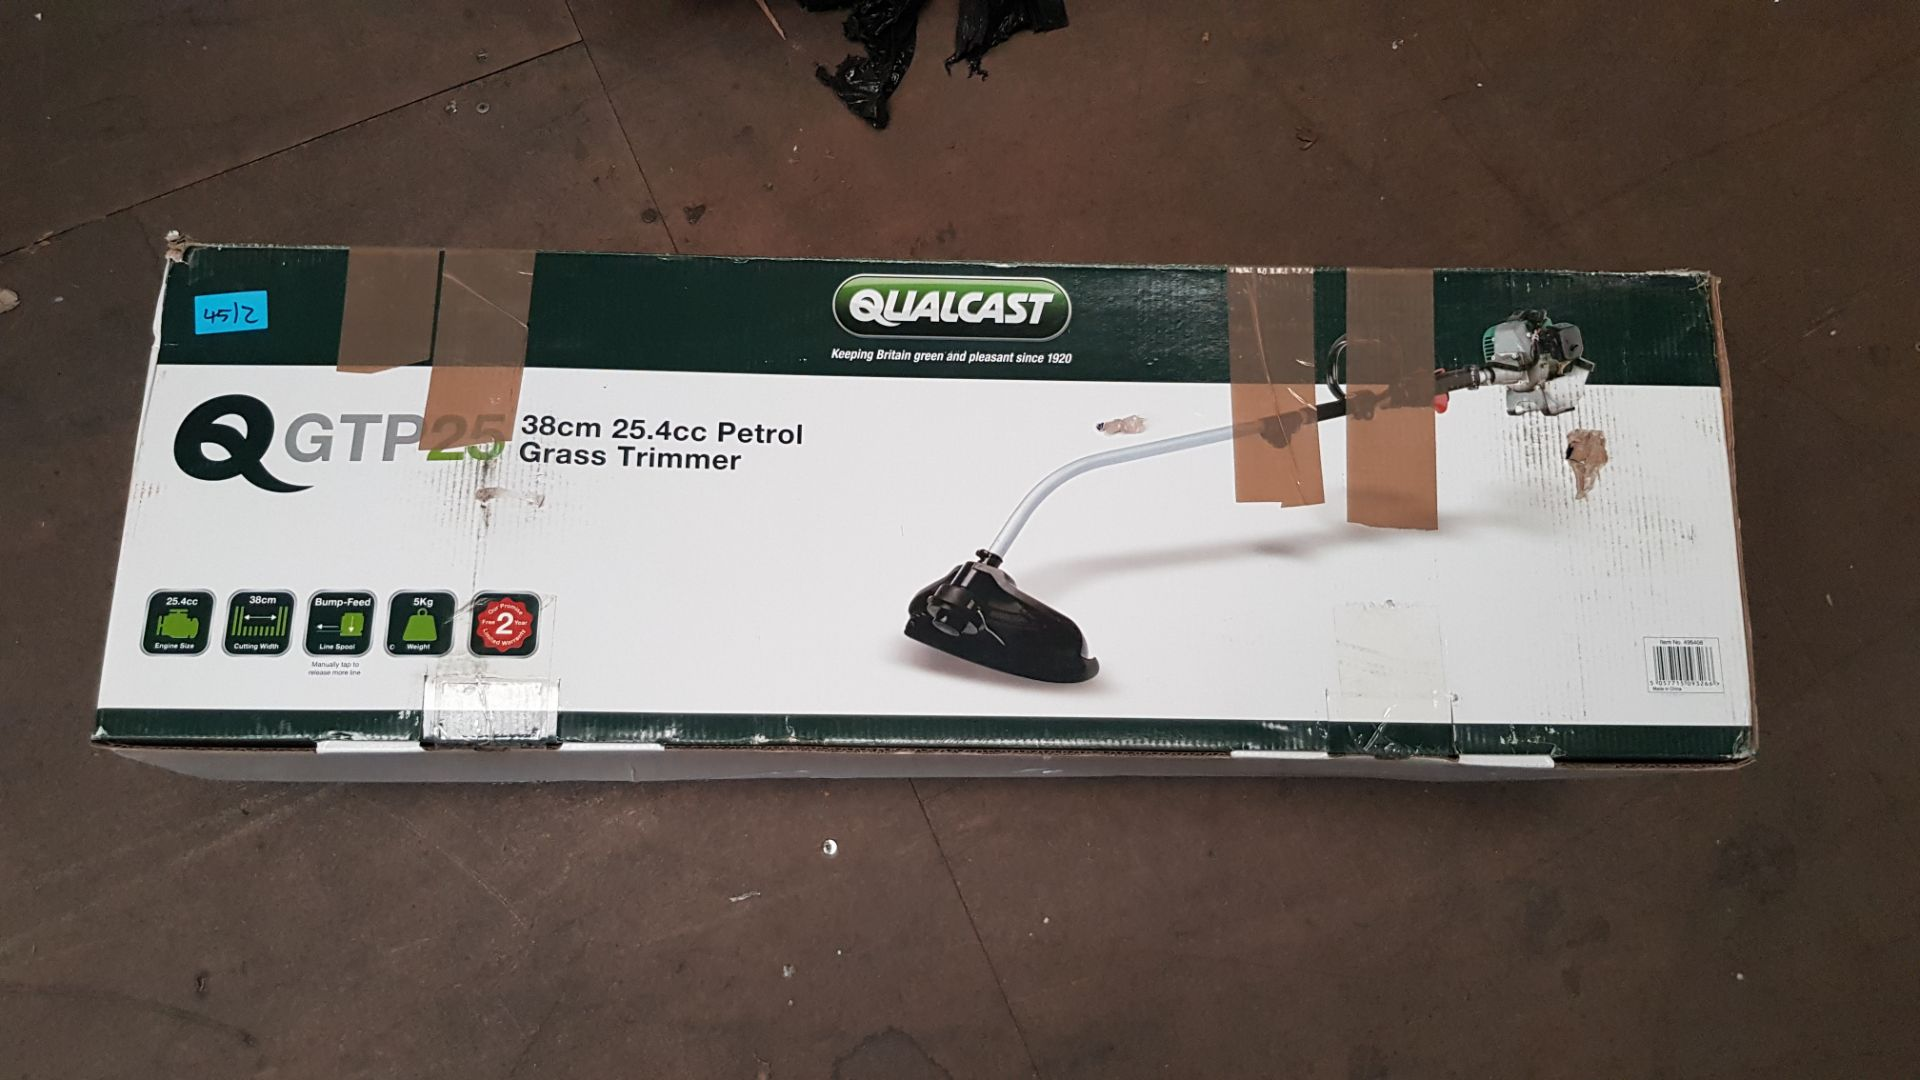 (P9) 2x Items. 1x Qualcast 25.4cc Petrol Grass Trimmer 38cm RRP £110. 1x Powerbase 51cm 20V Cordles - Image 4 of 4